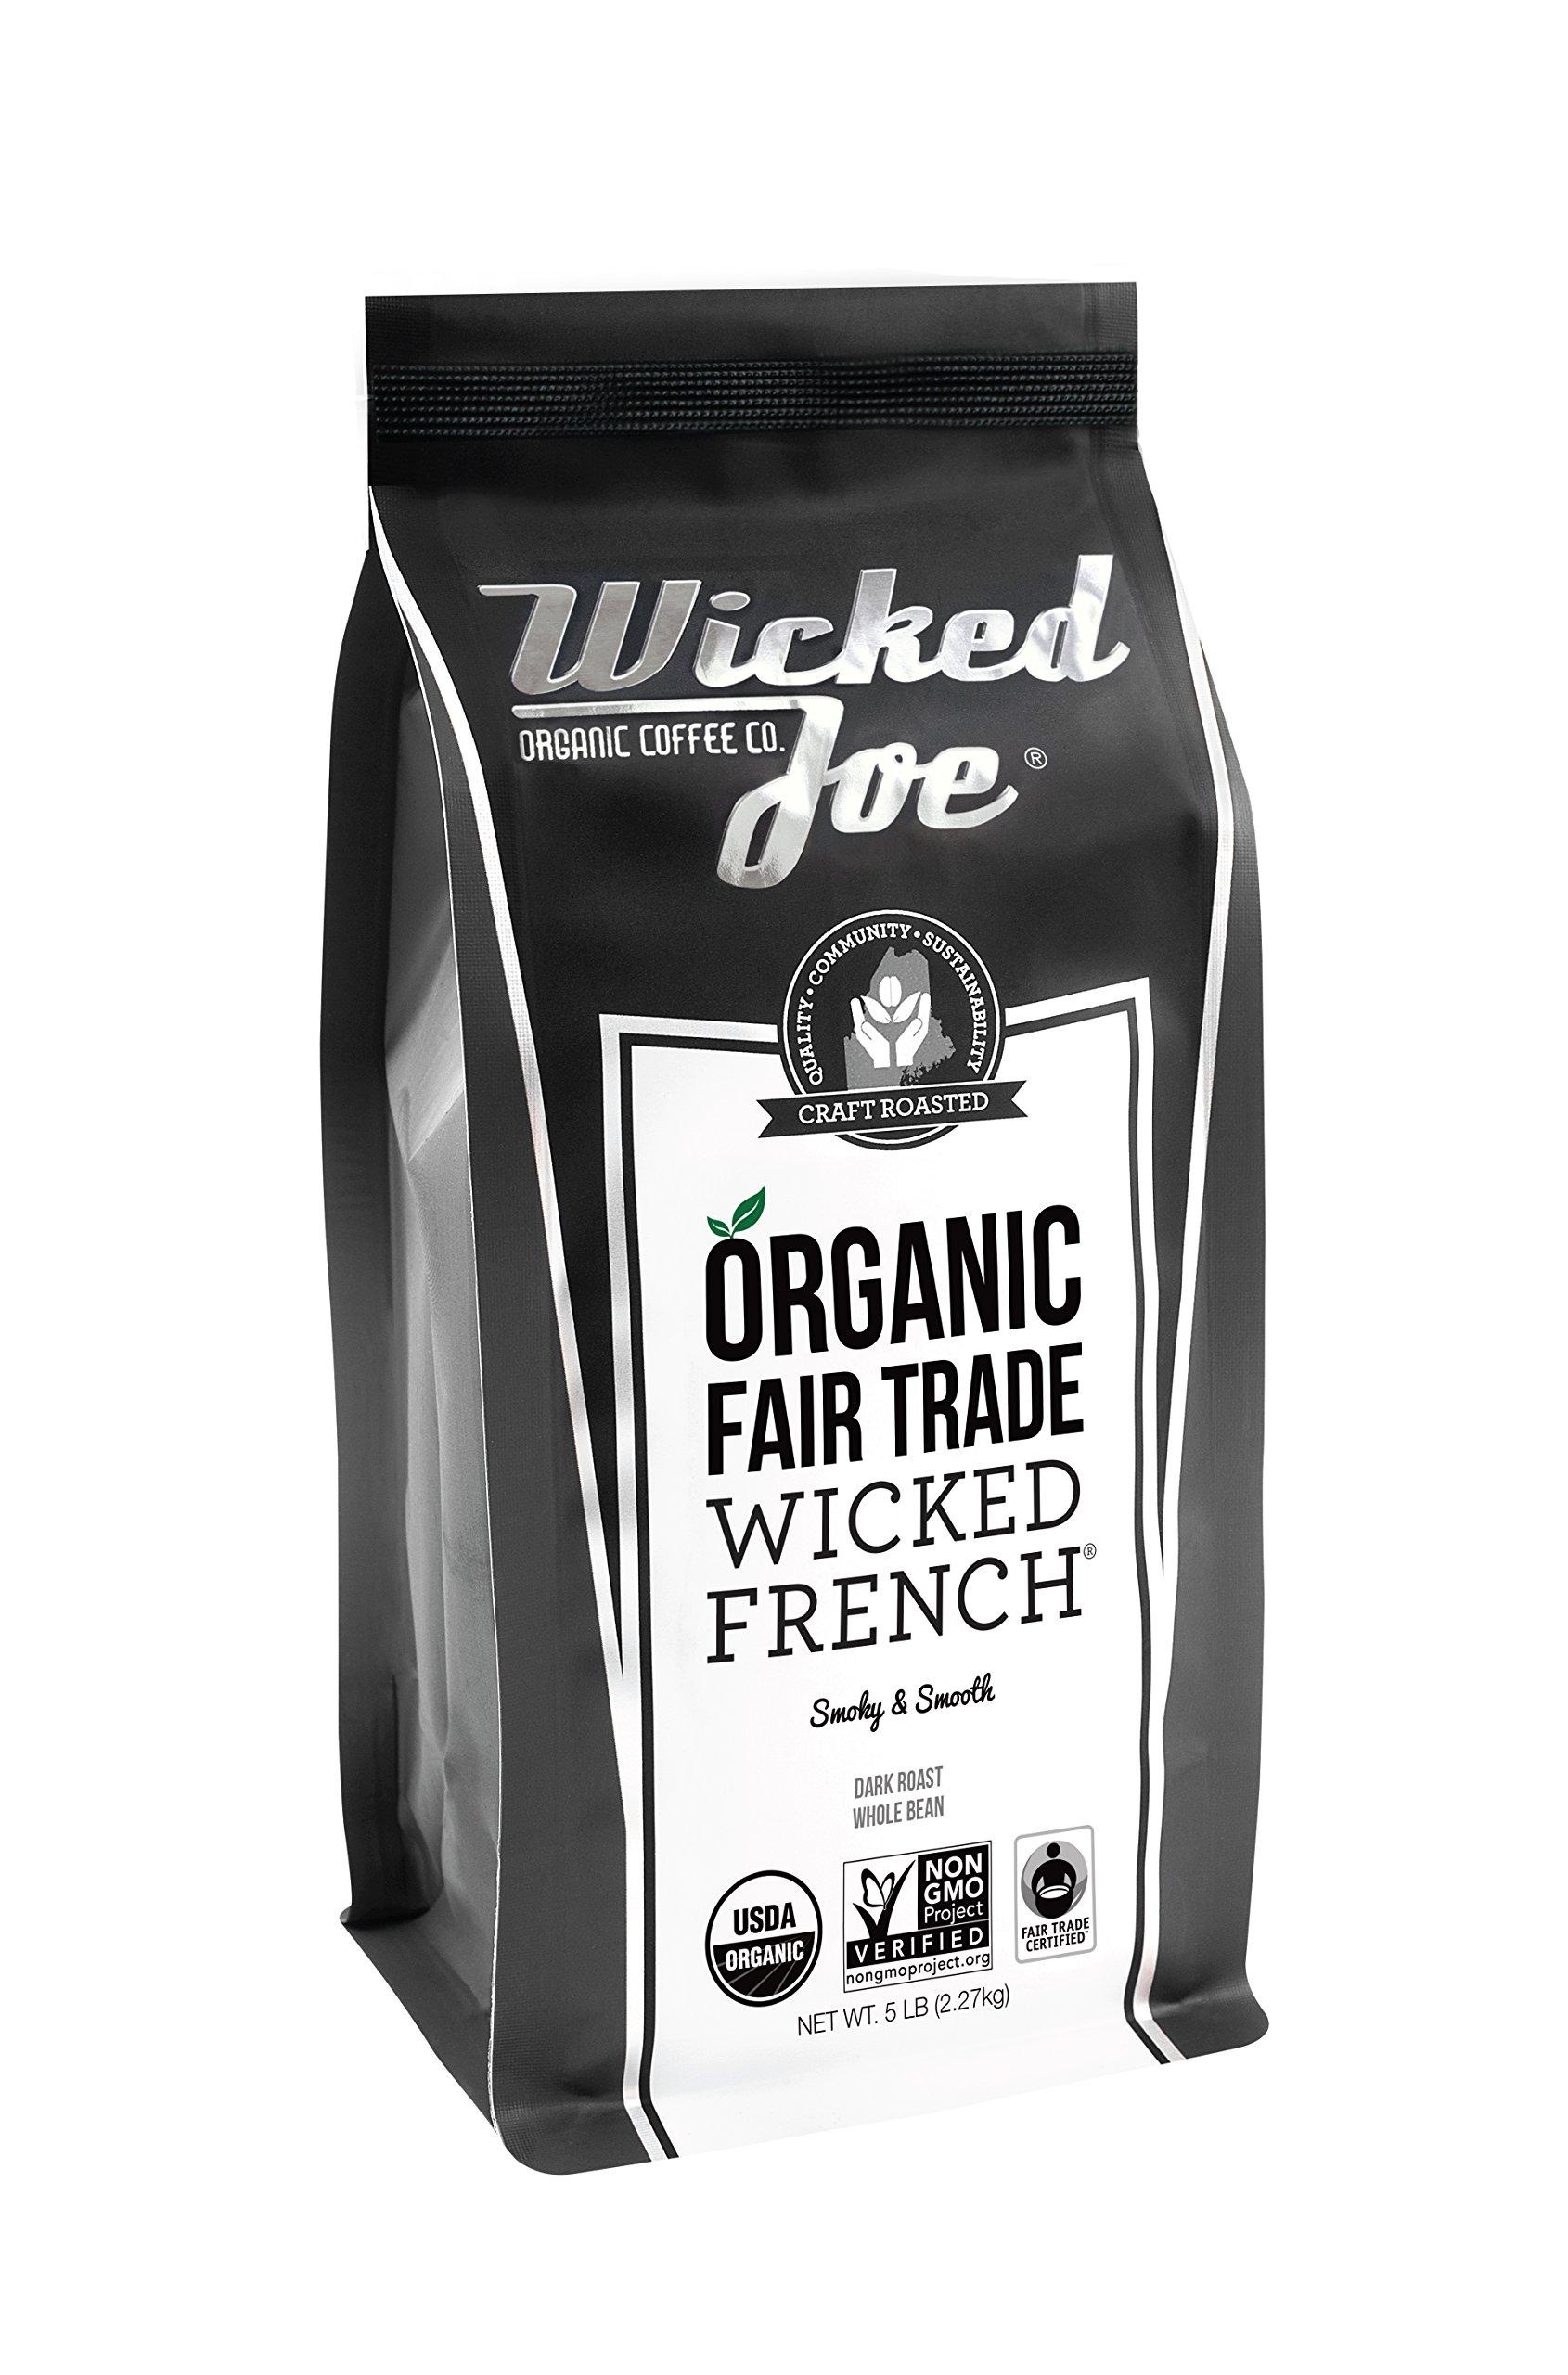 Wicked Joe Organic Coffee Fair Trade Organic Whole Bean, French, 5 Pound